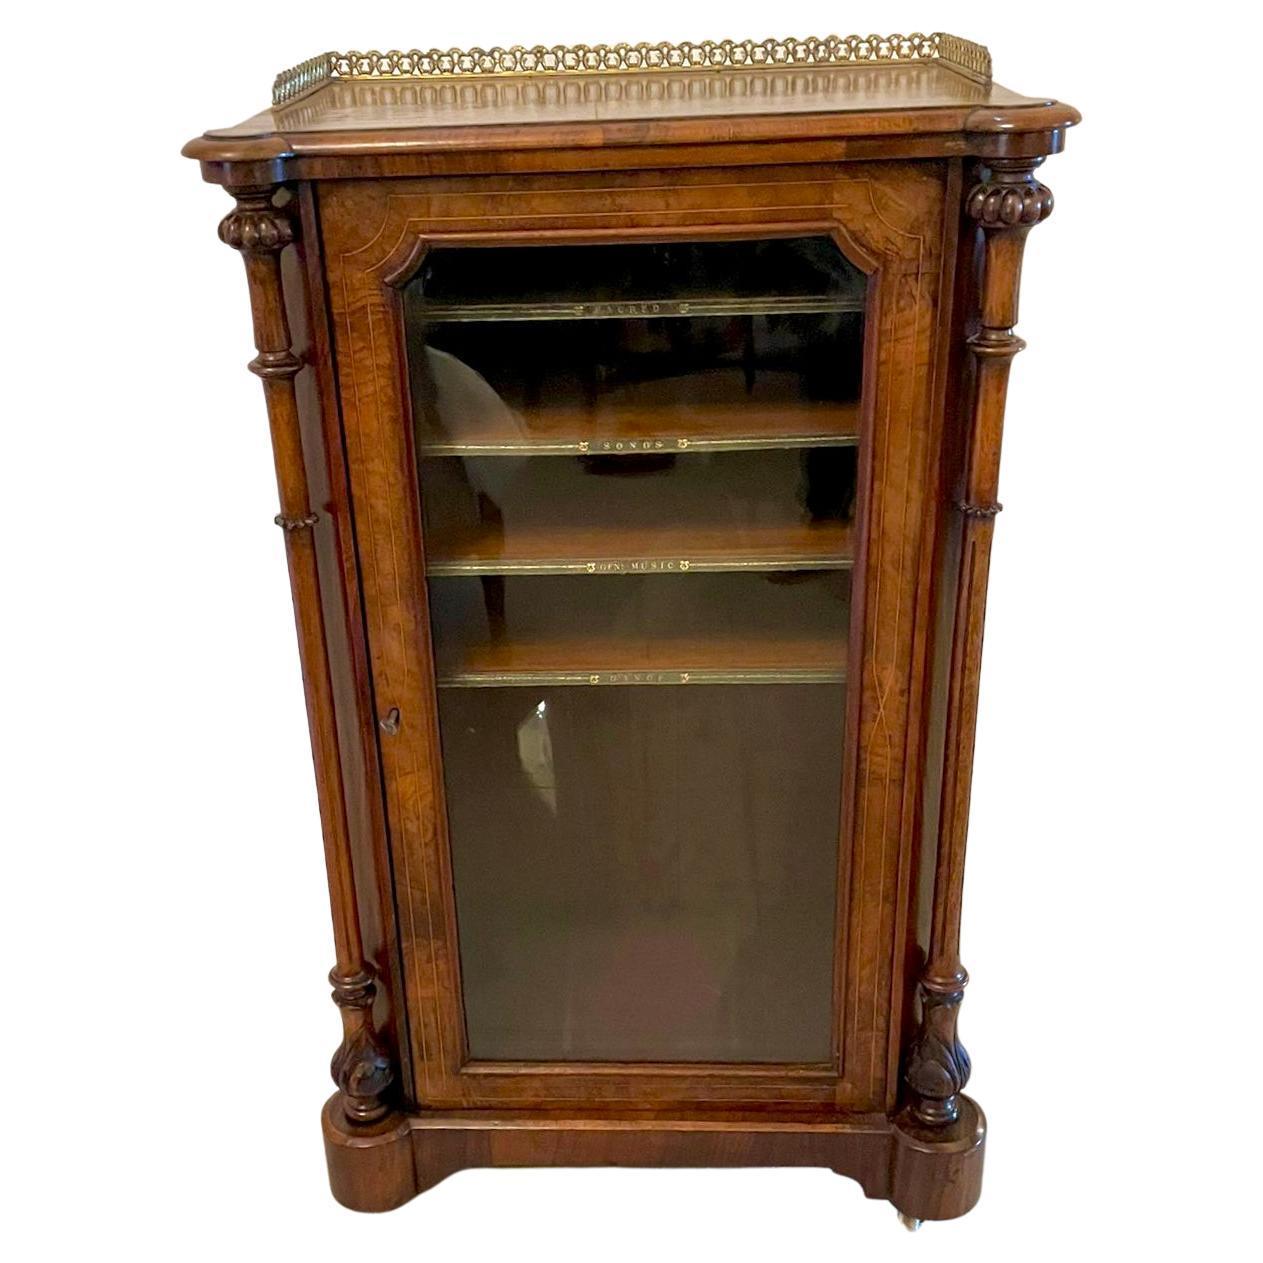 Quality Antique Victorian Inlaid Burr Walnut Music Cabinet